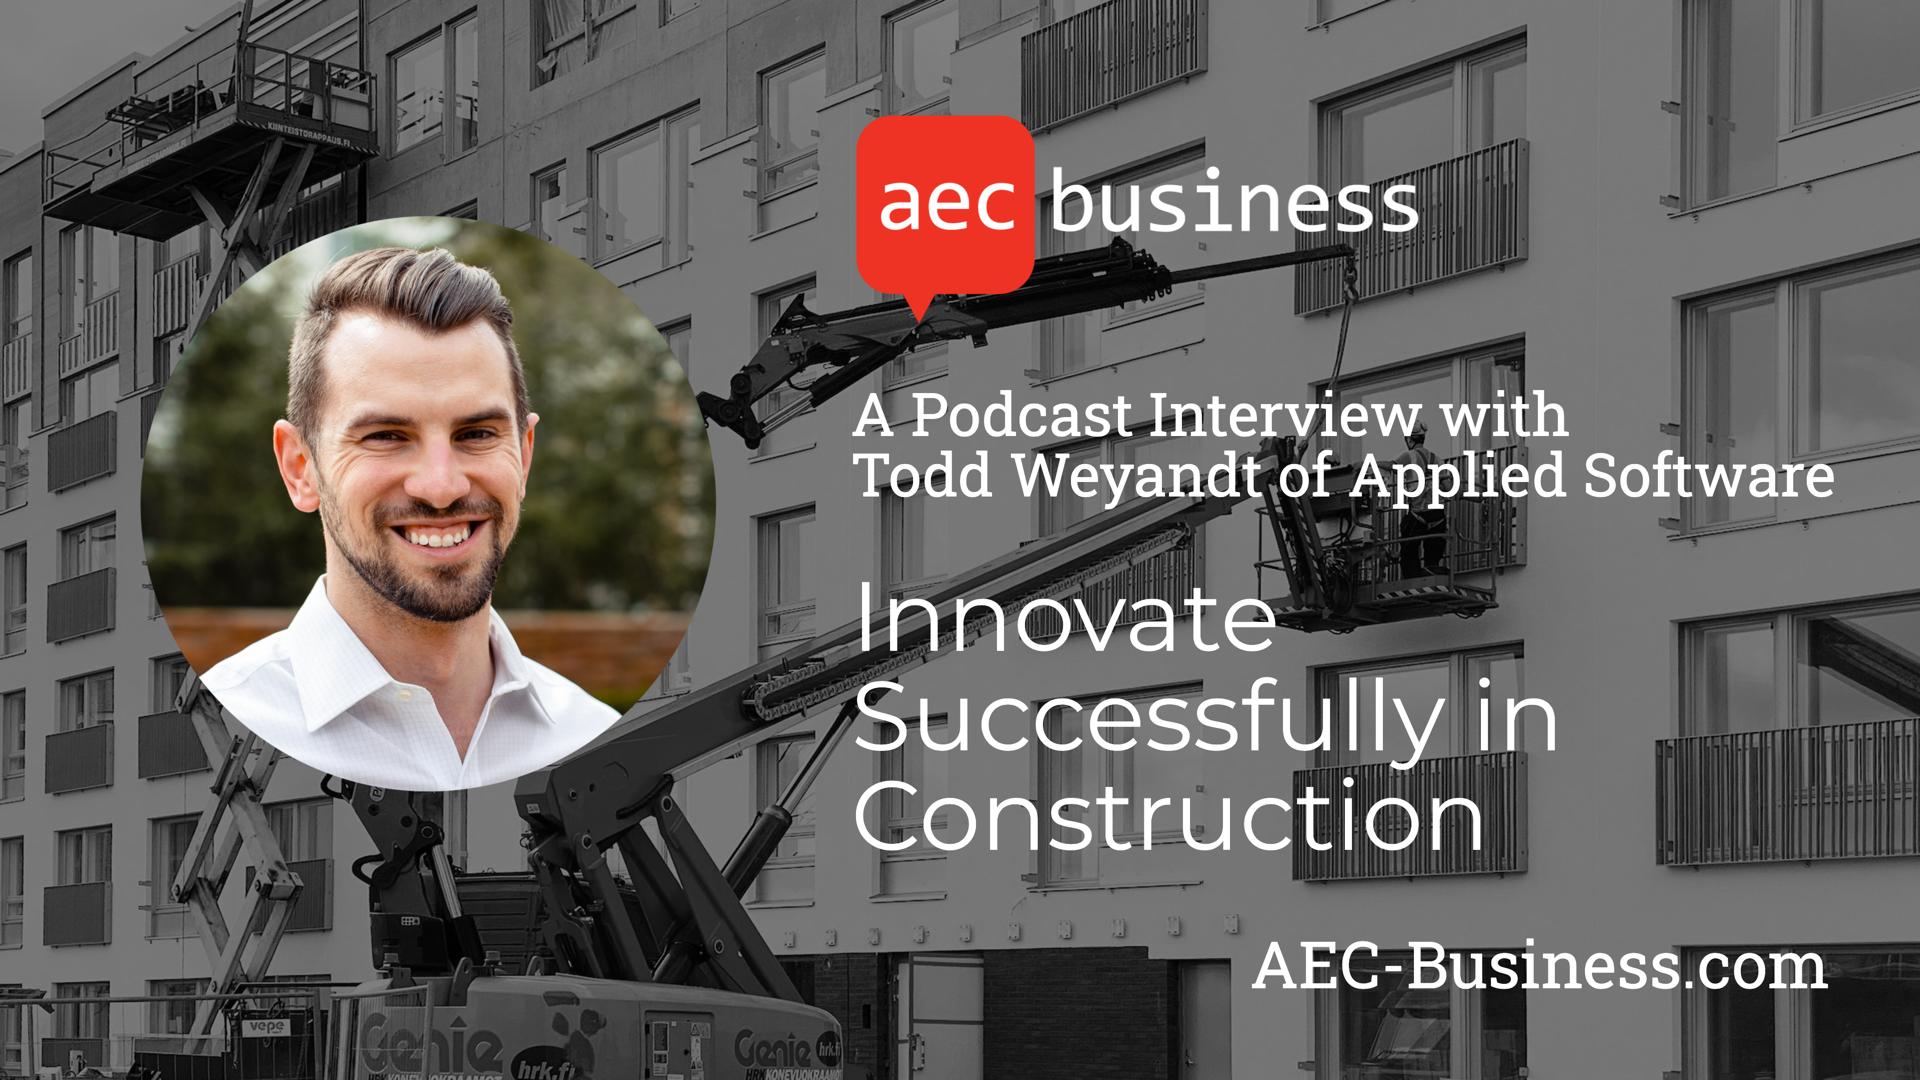 Todd Weyandt podcast interview